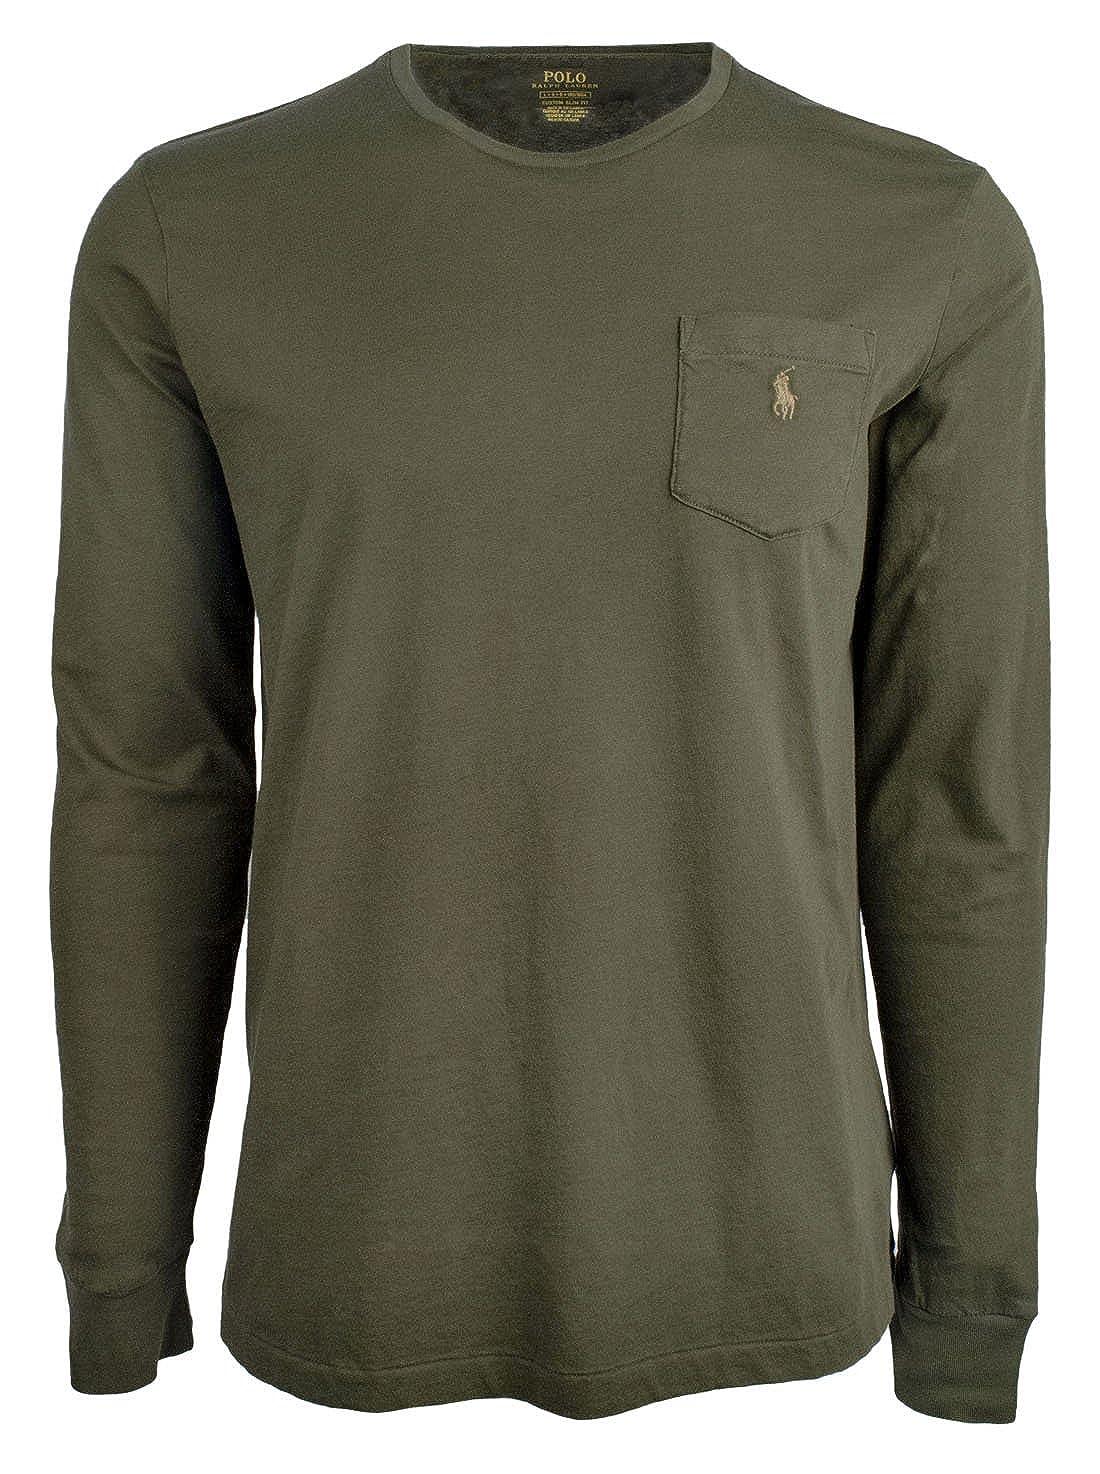 00e9837788b720 Custom Long Sleeve T Shirts With Pocket